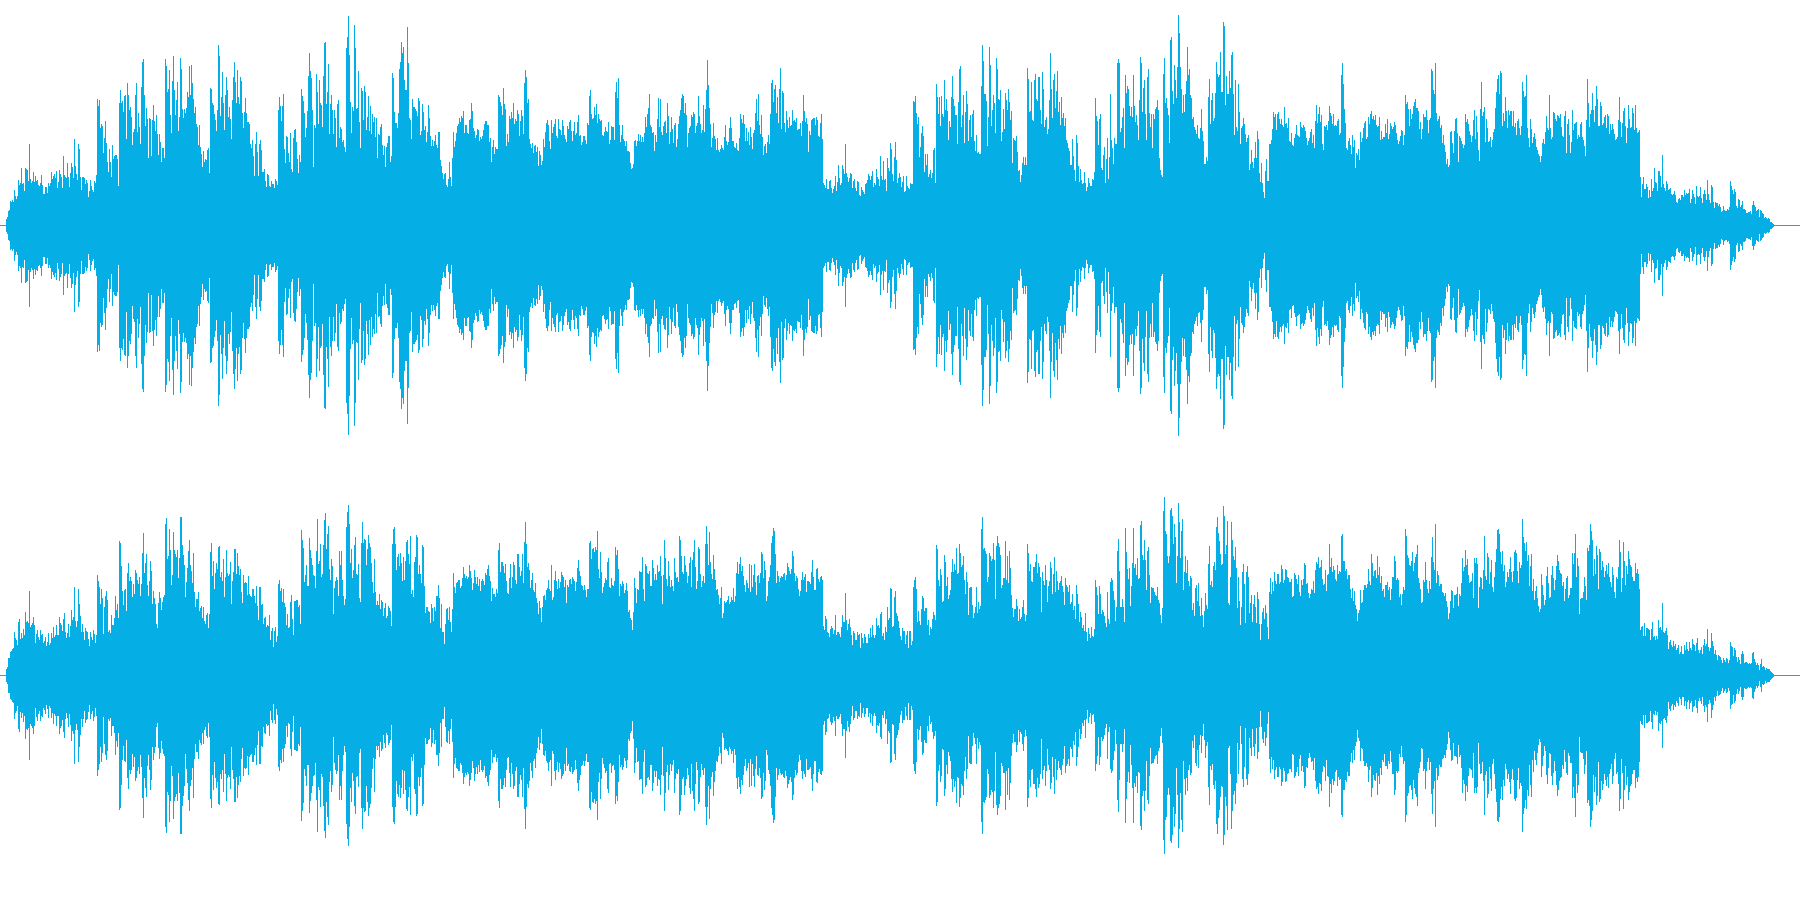 RPGの神秘的な森をイメージしたBGMの再生済みの波形